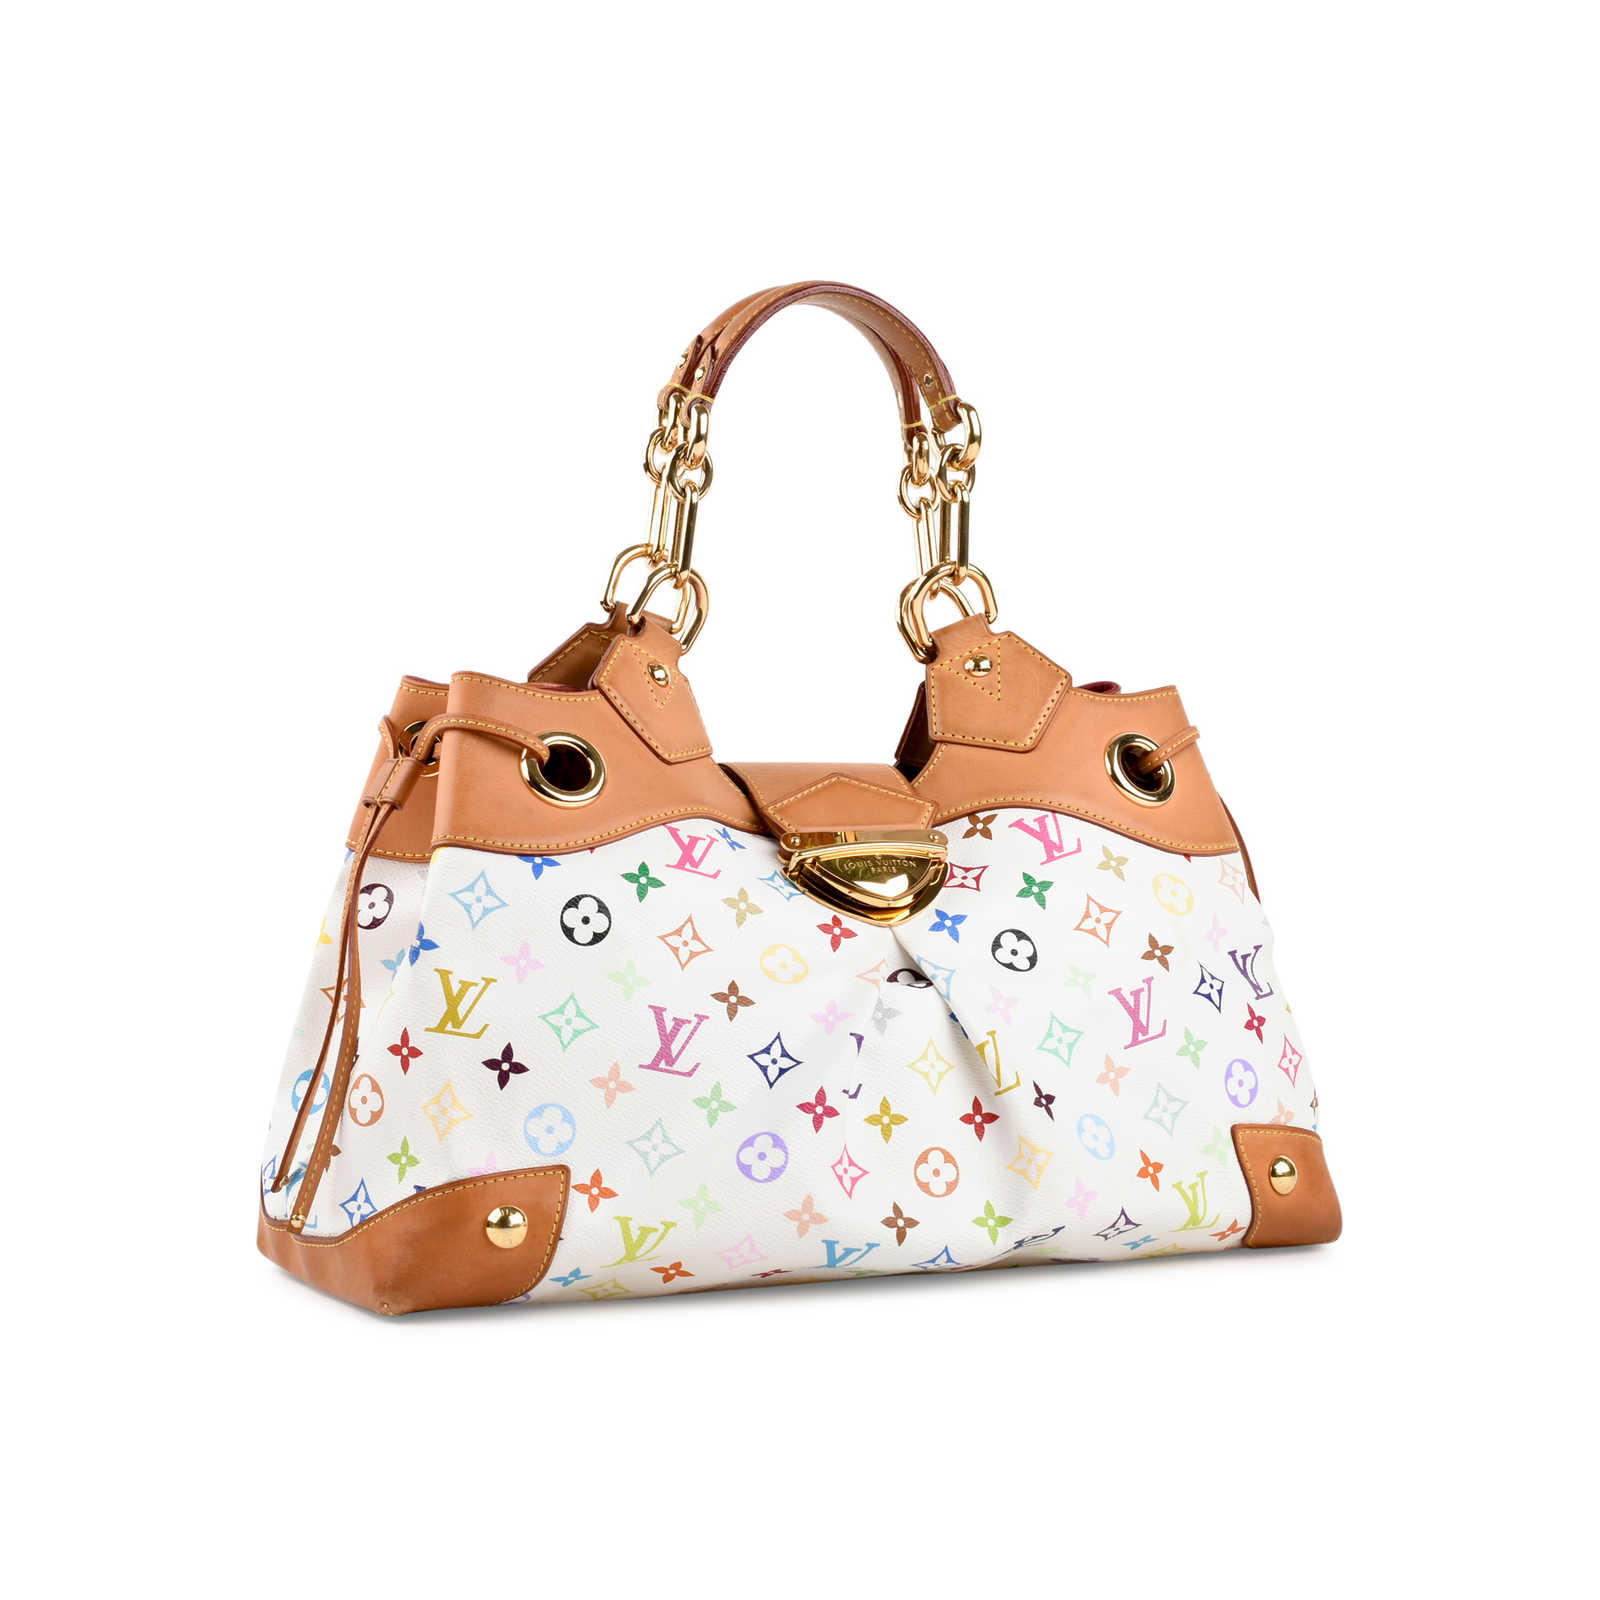 5718e04a101 Authentic Second Hand Louis Vuitton Multicolore Monogram Ursula Bag ...